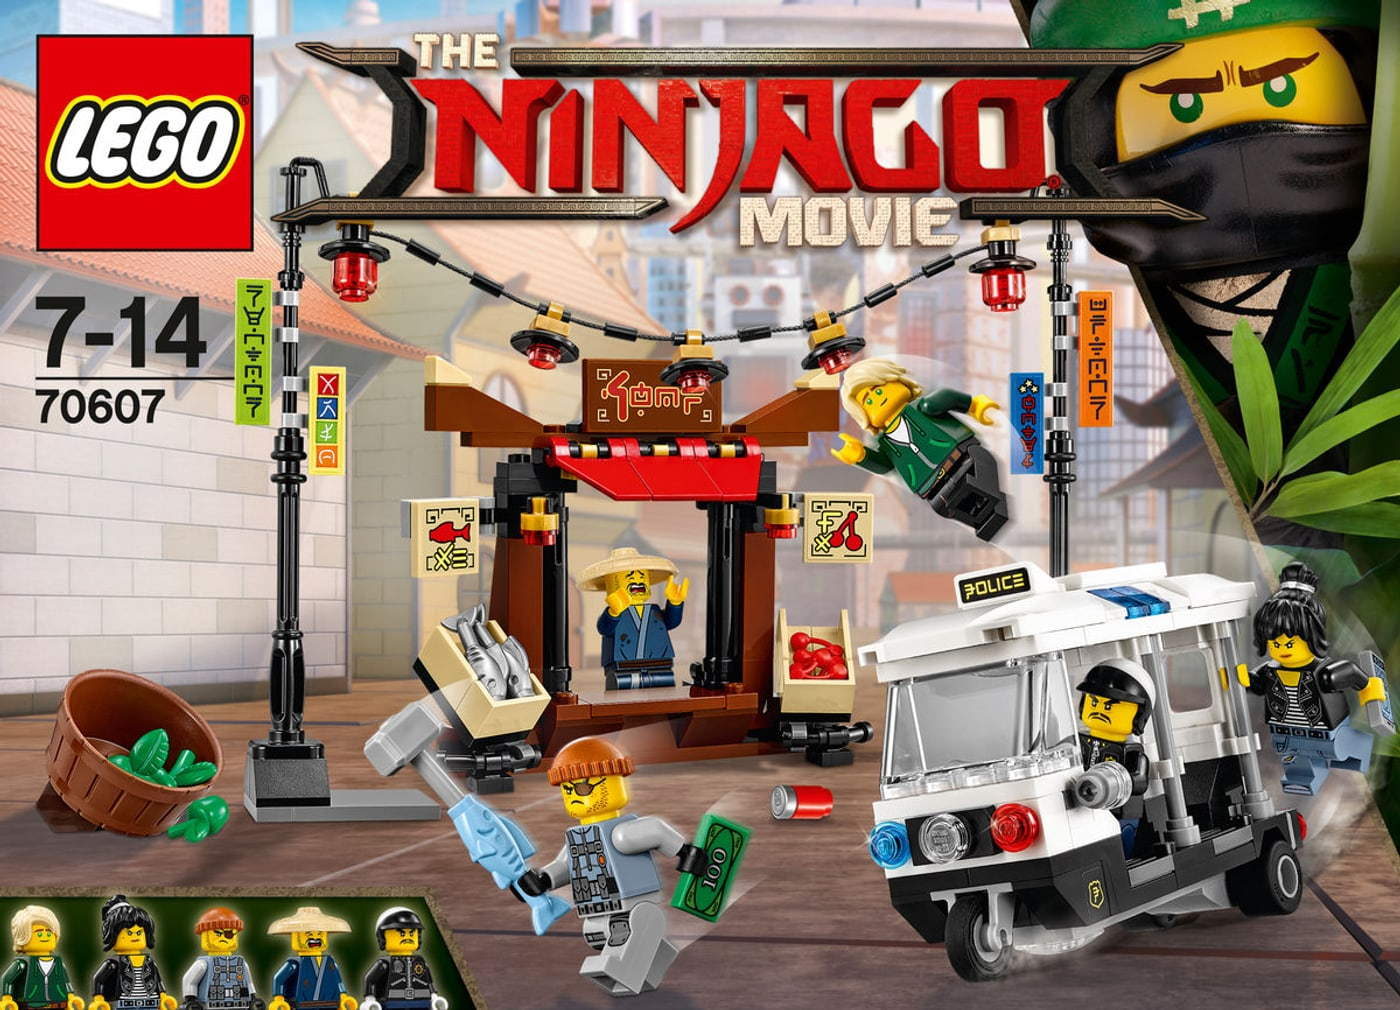 Lego ninjago verfolgungsjagd in ninjago city 70607 migros - Lego ninjago d or ...